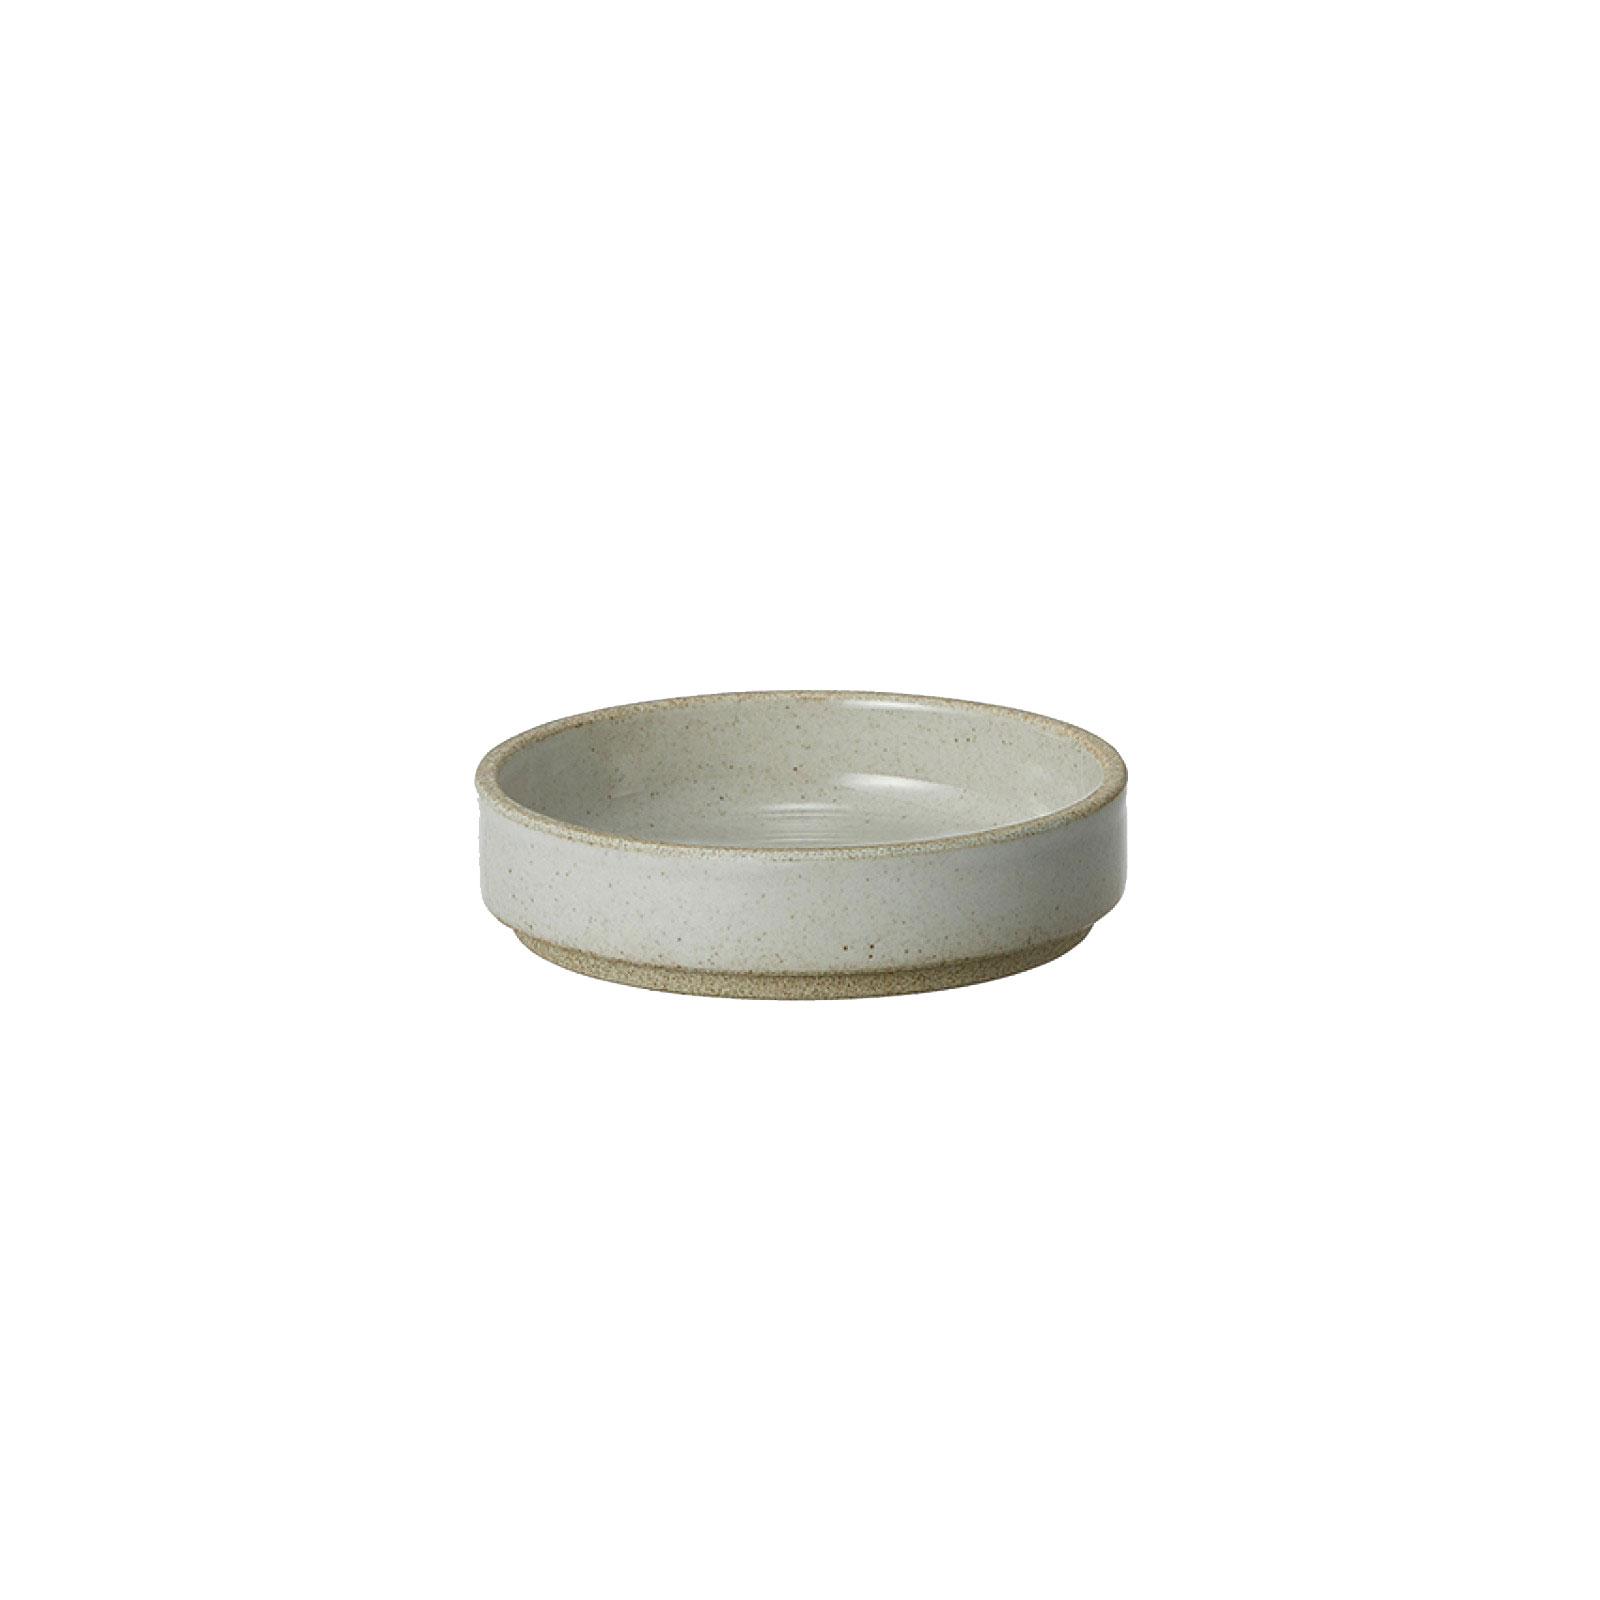 HPM001 Hasami Plate glossy Ø 8,5 cm